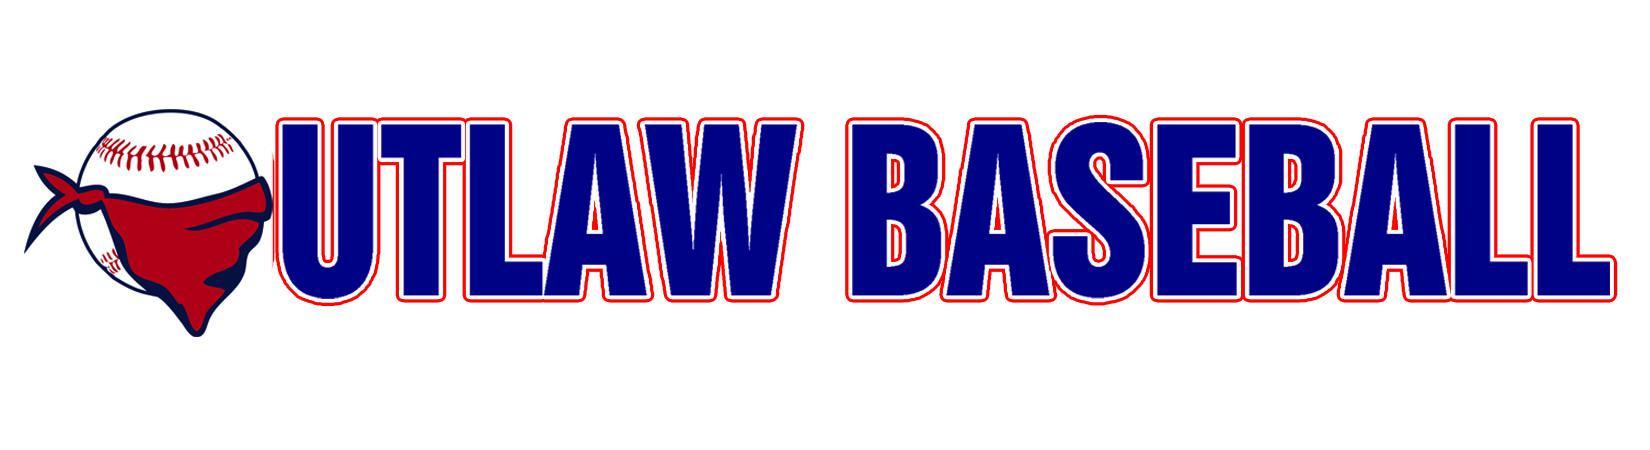 Outlaw baseball across